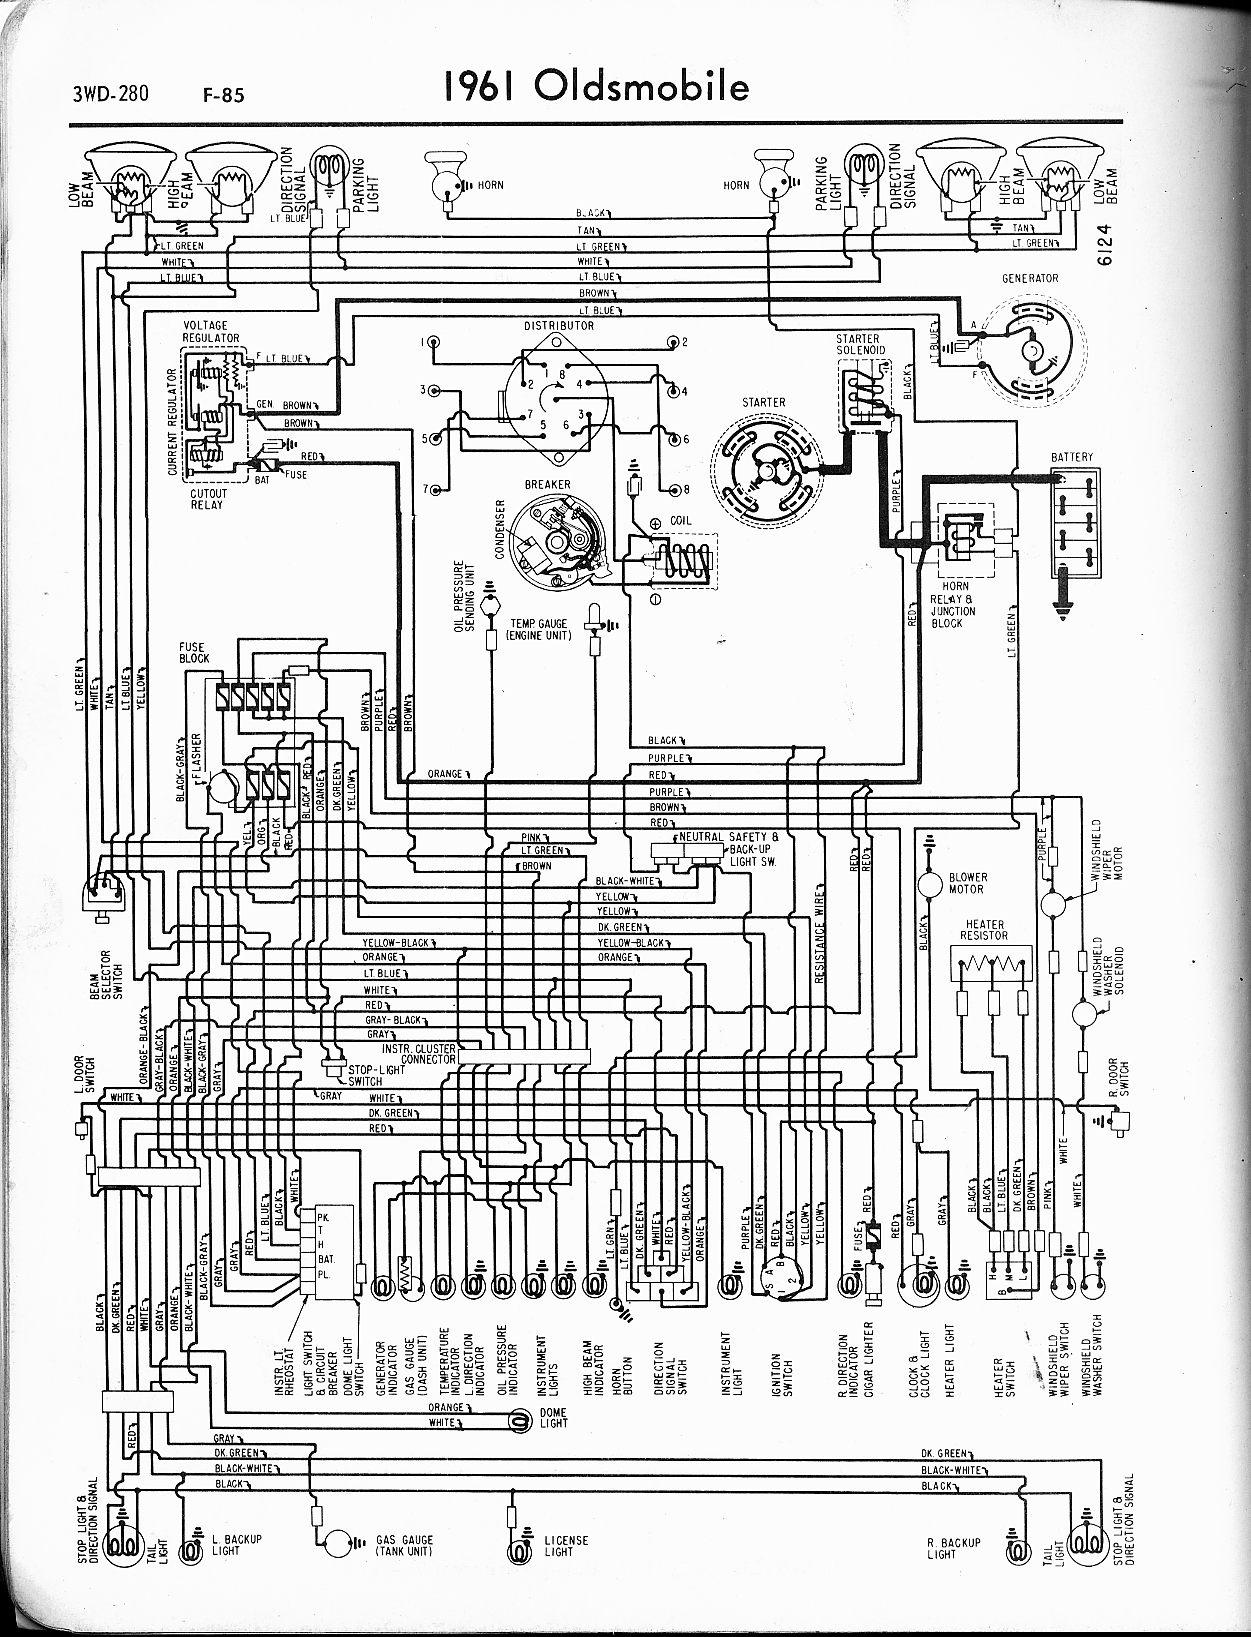 service manual pdf 1996 oldsmobile 98 wire diagram 96 oldsmobile bravada ignition wiring harness #12